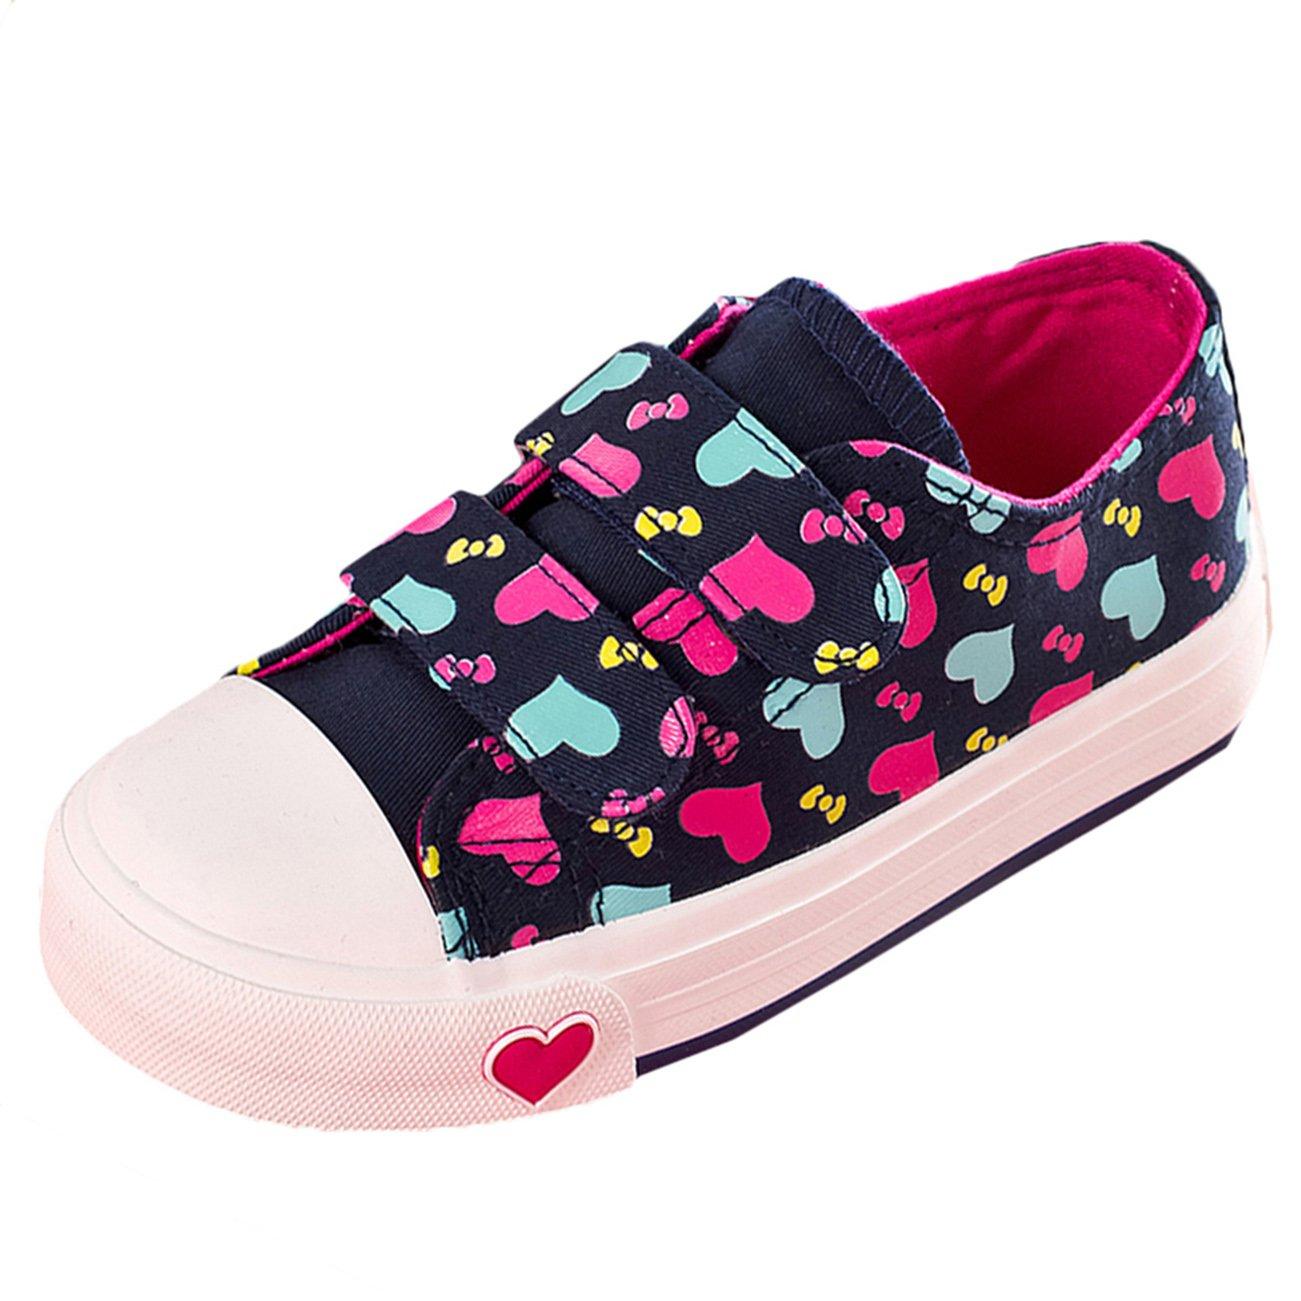 Scothen Kinderschuhe Sportschuhe Turnschuhe Halbschuhe Schuhe Kids Schuhe für Mädchen Canvas Kinder Schuhe Laufen Sport Baby Turnschuhe Sneaker